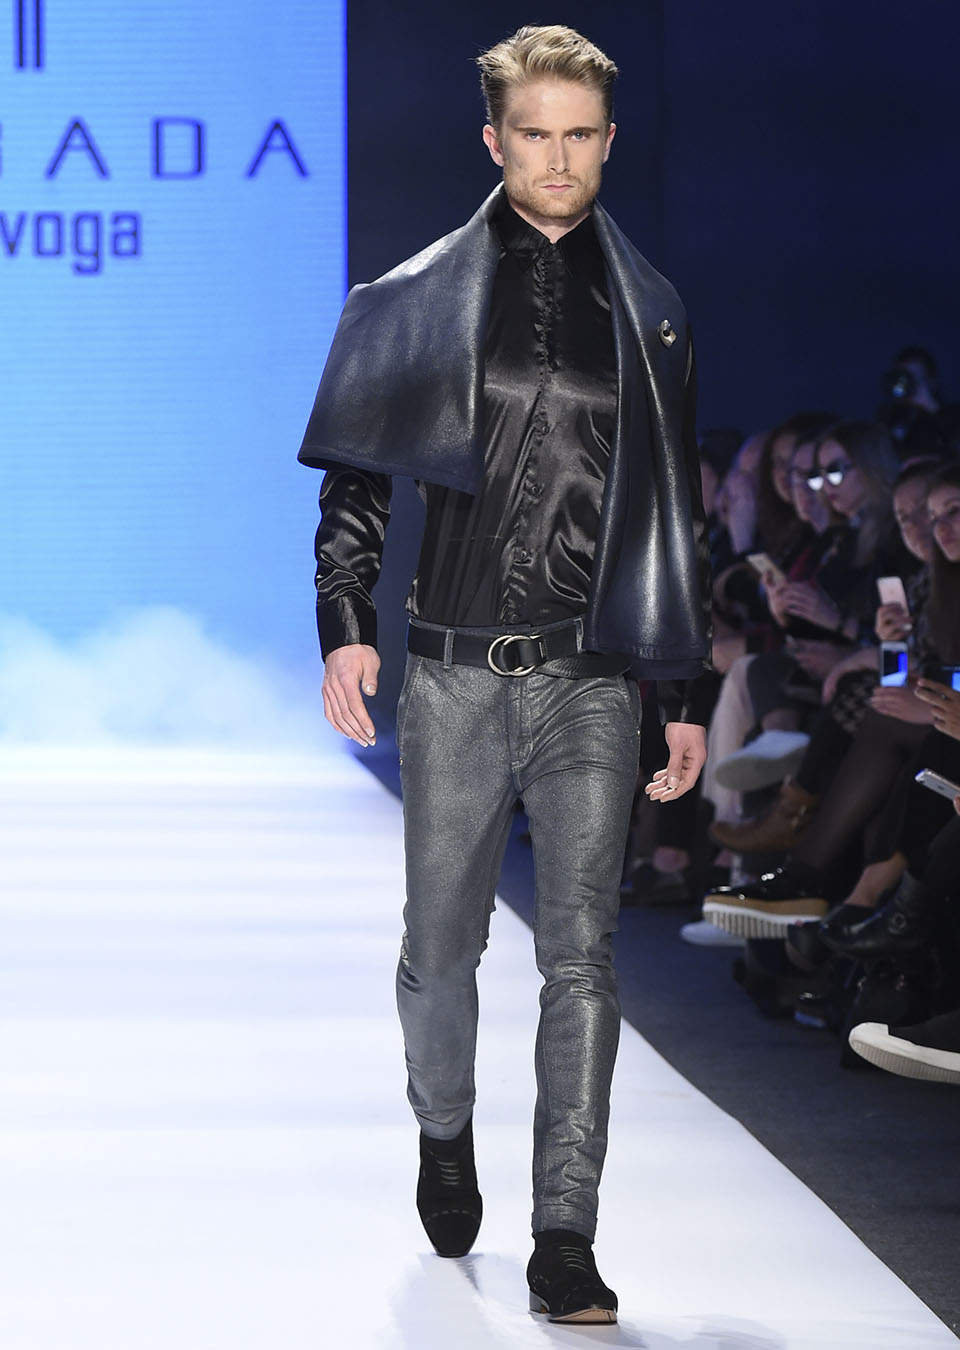 Bogota Fashion Week 2017